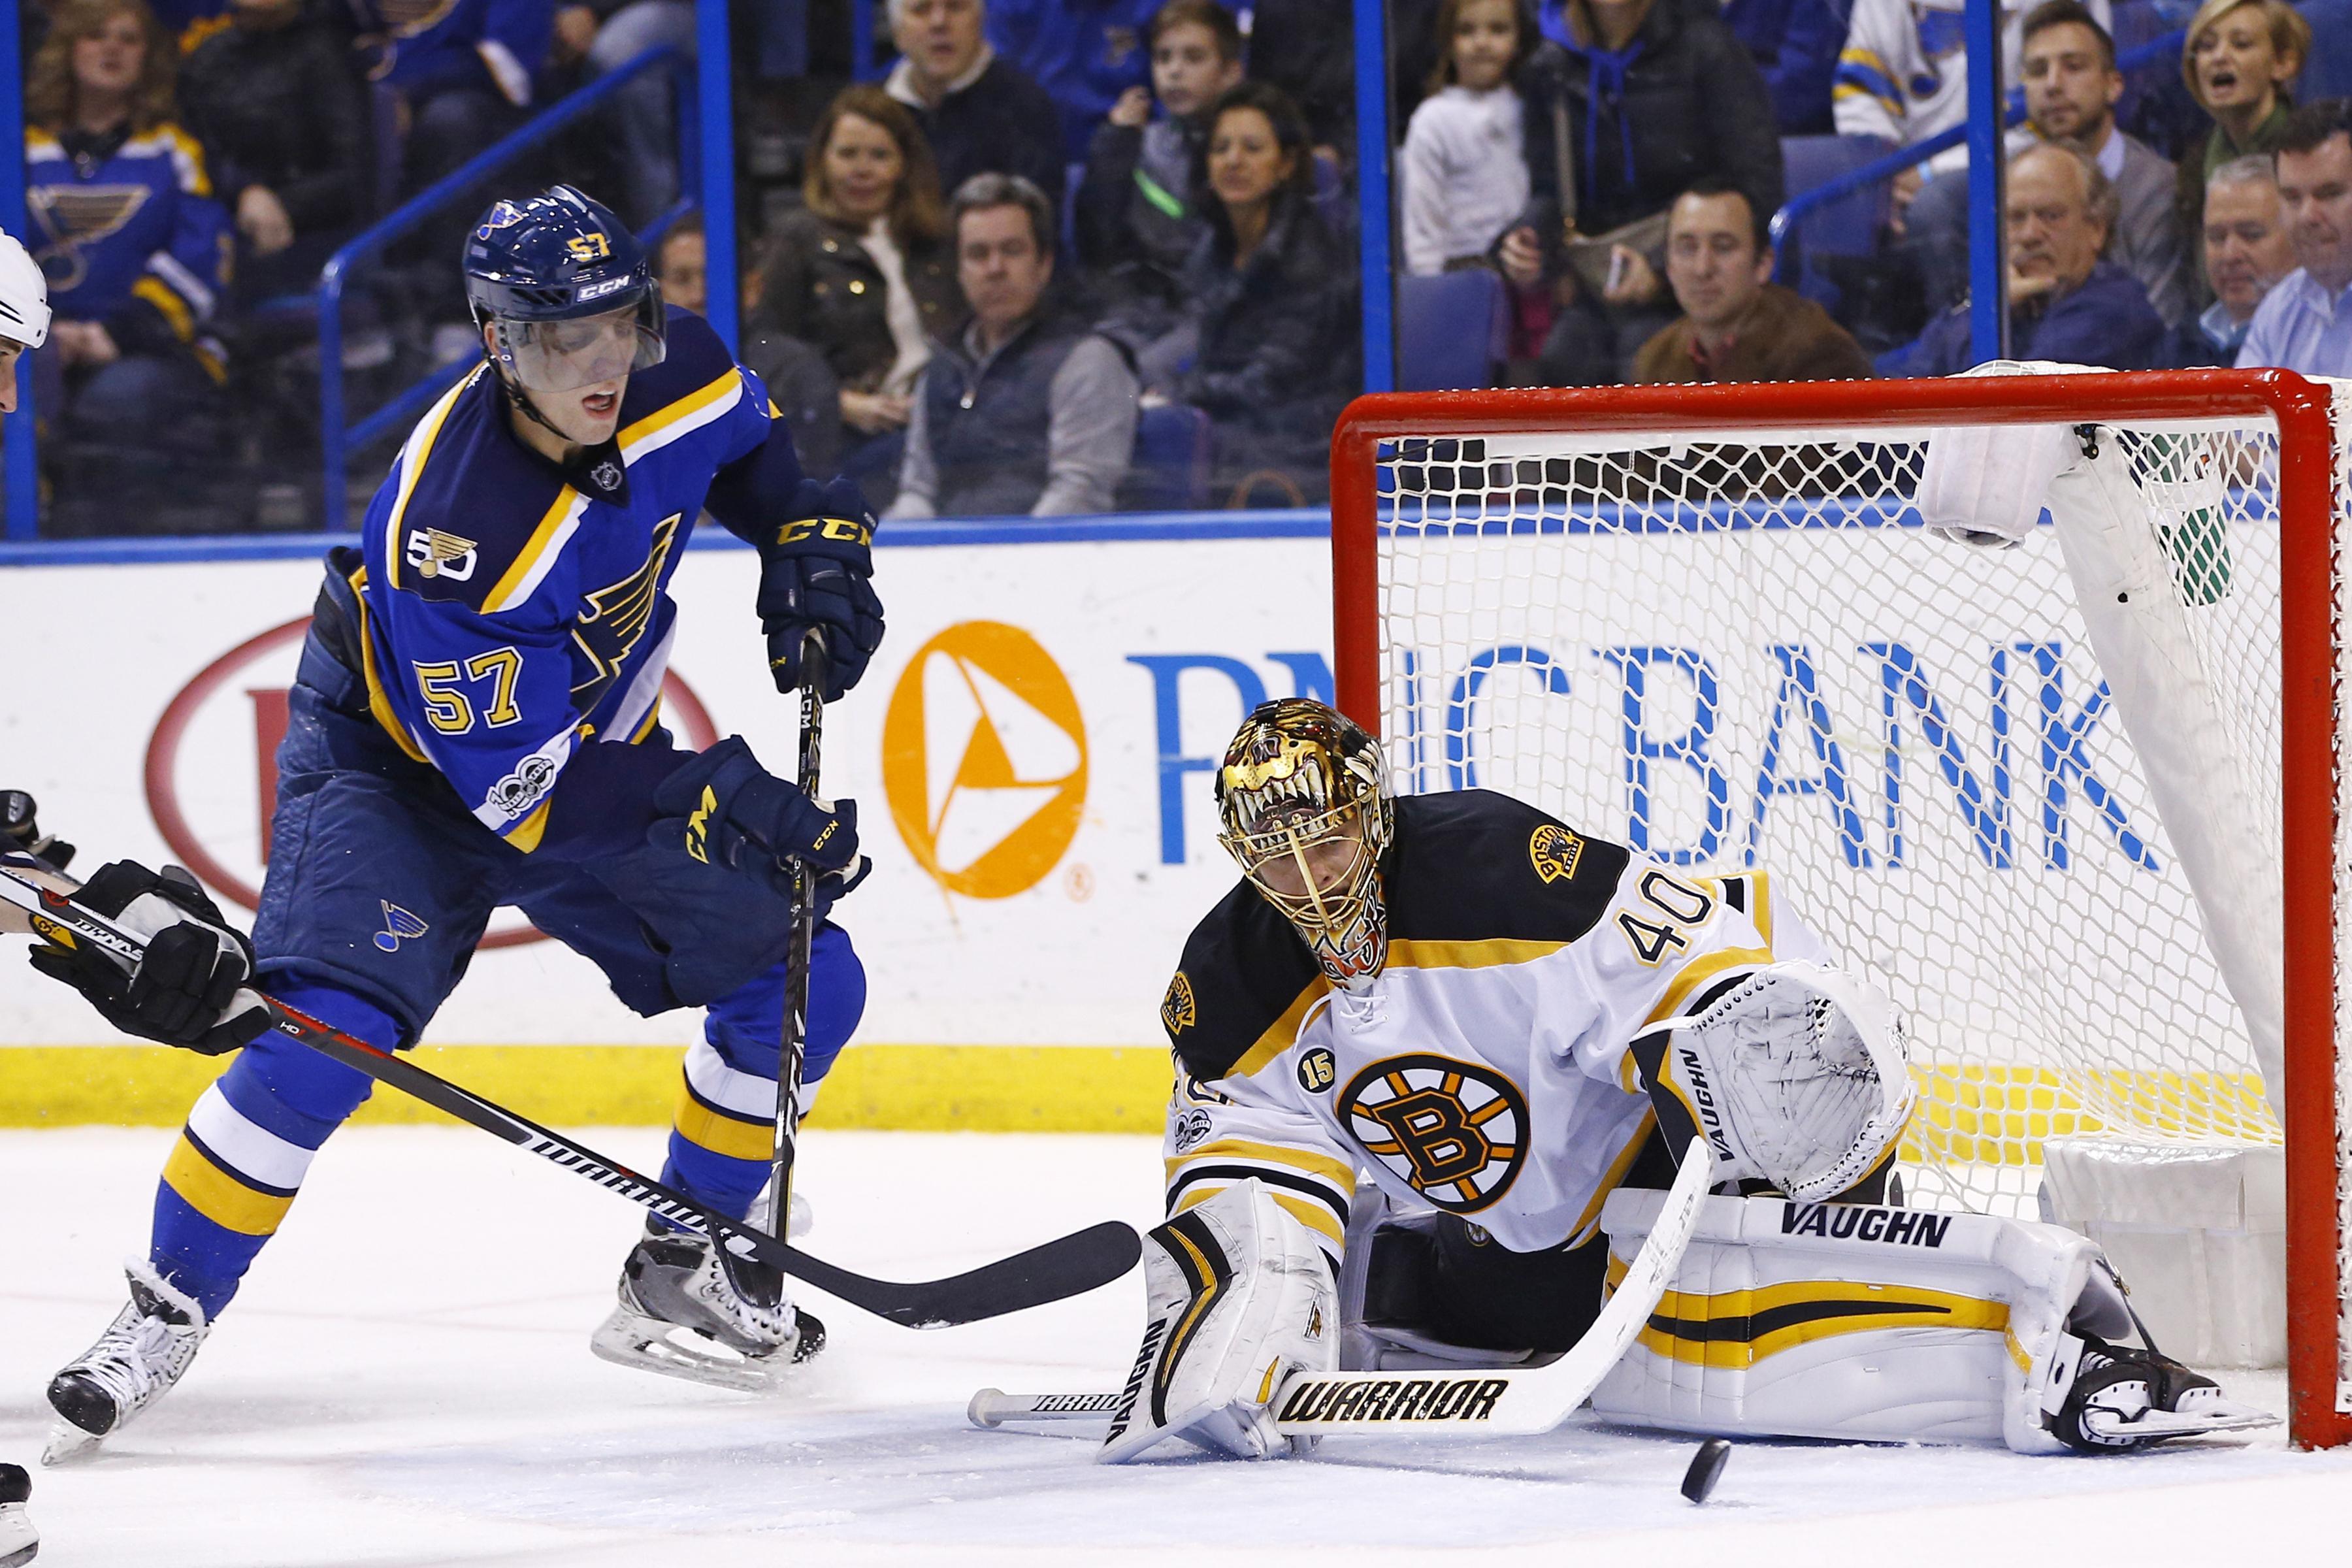 Bruins_blues_hockey_74087